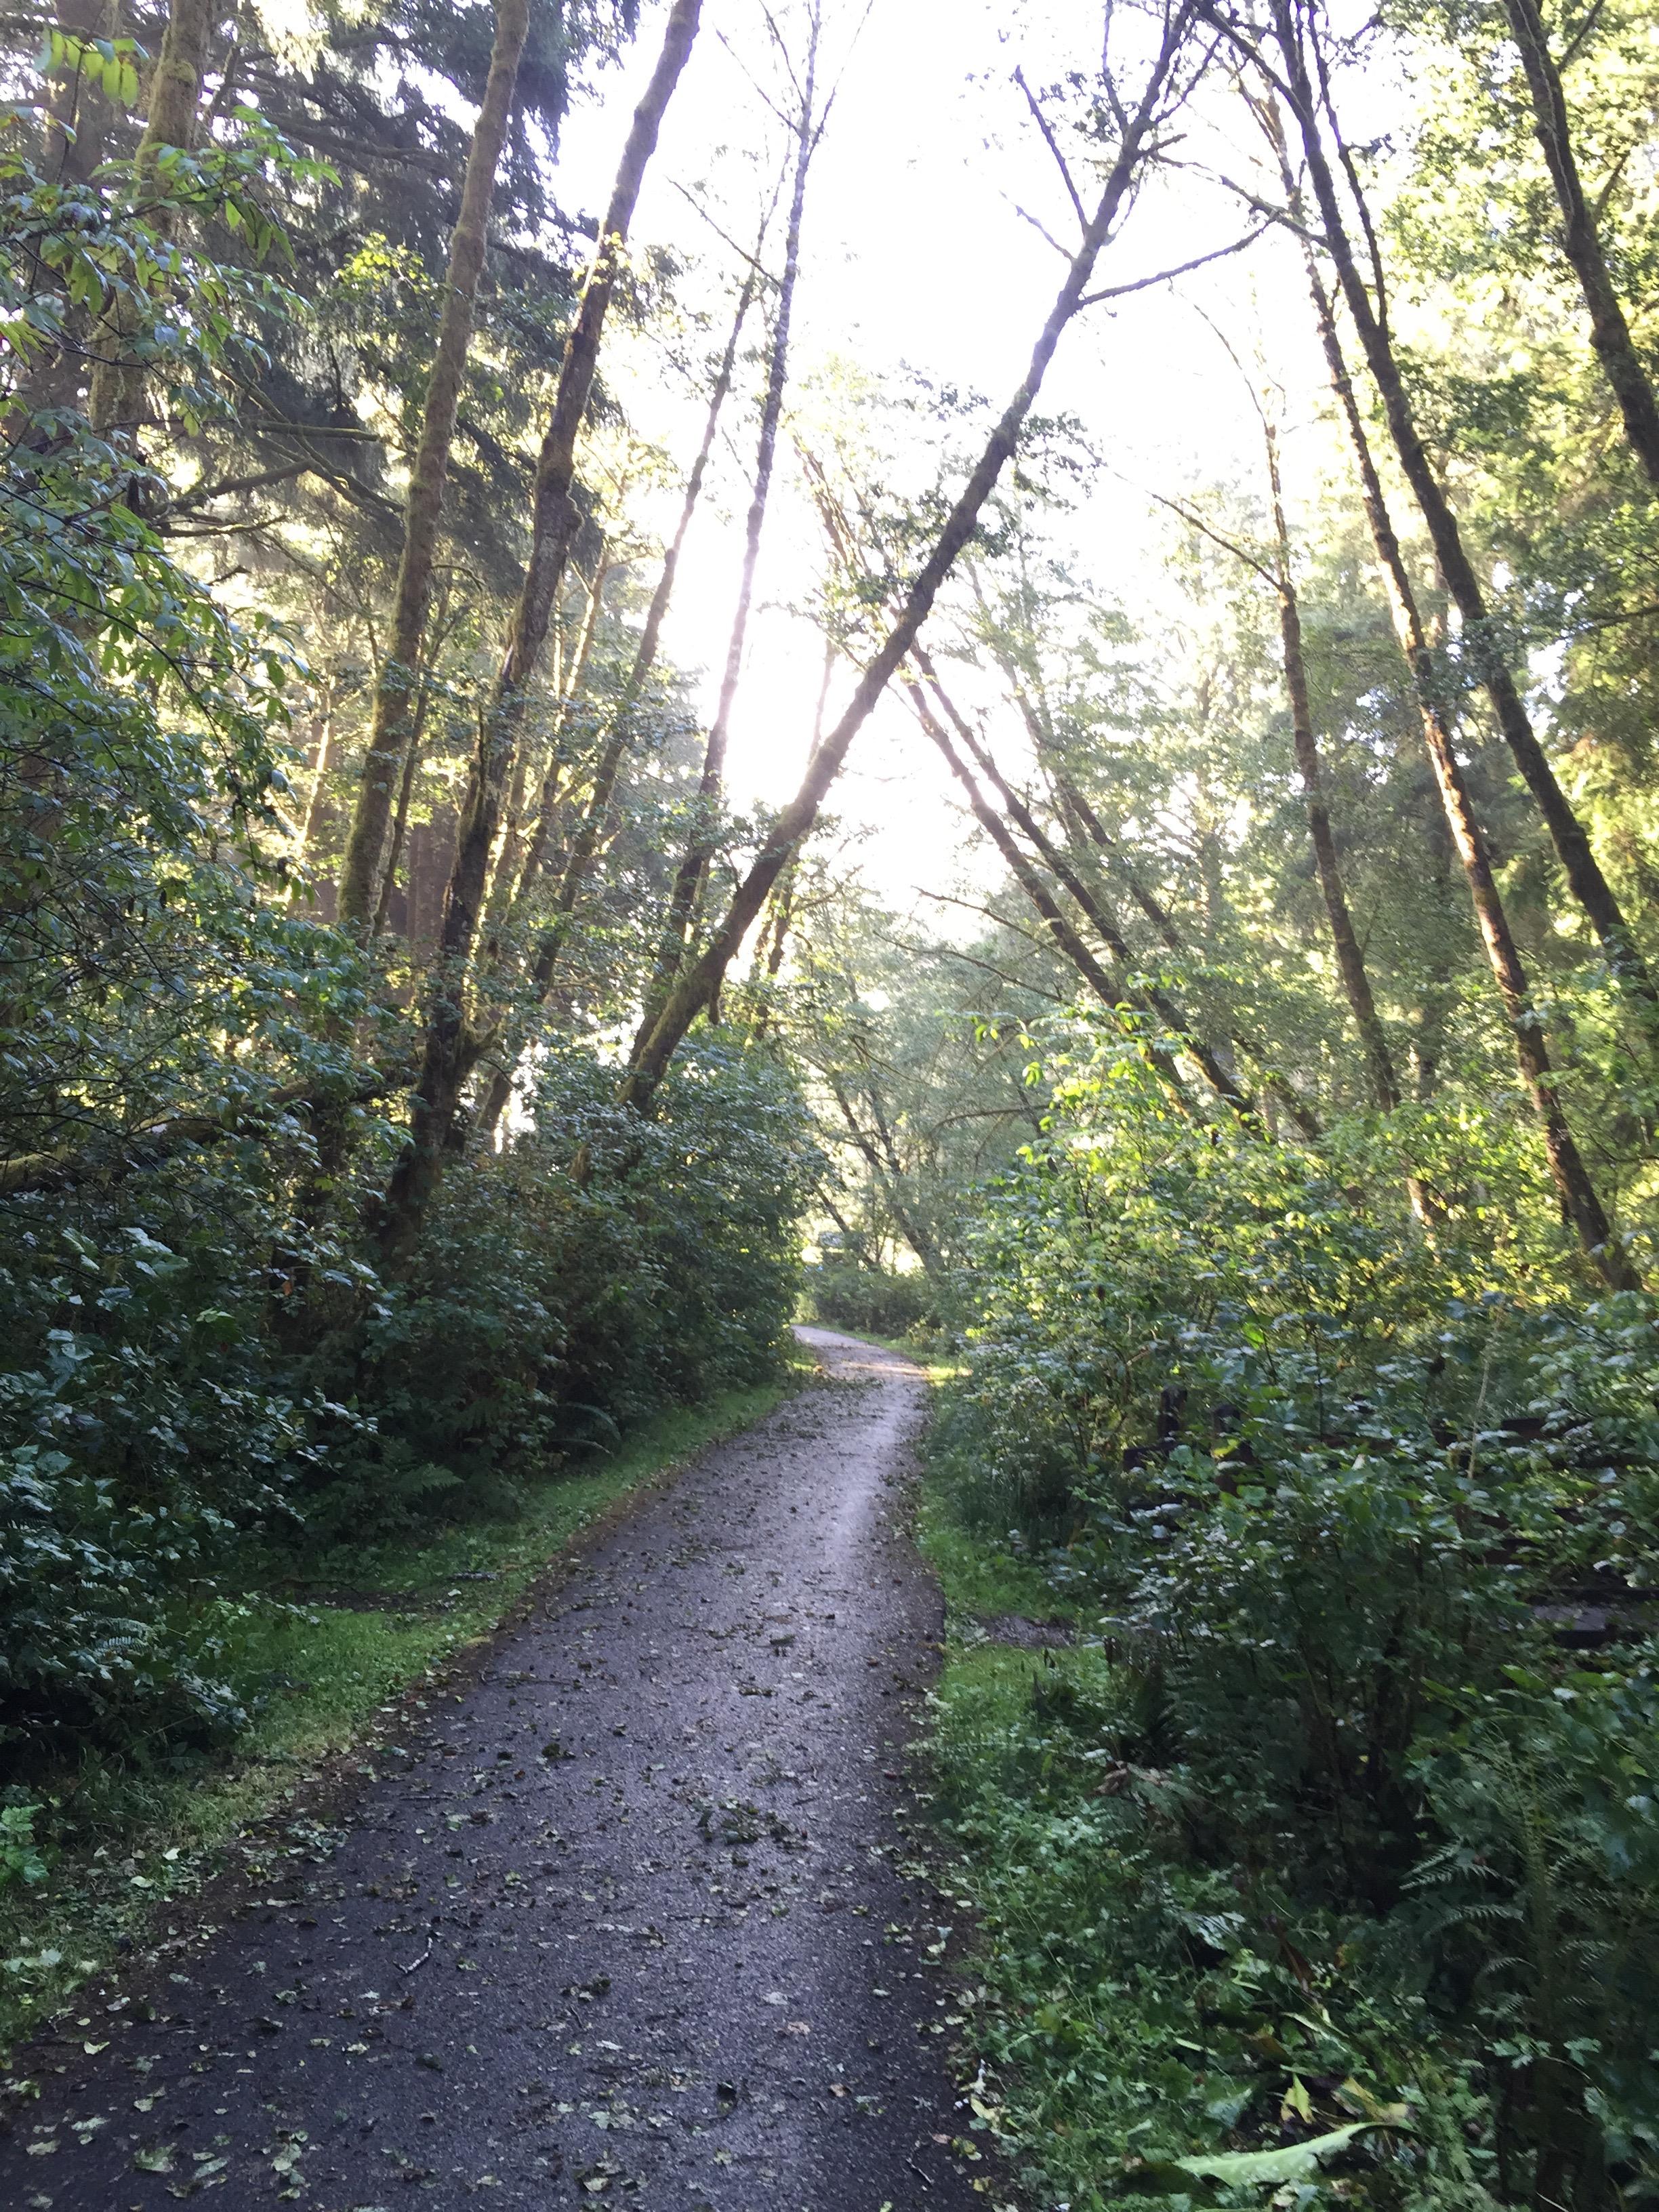 A phalanx of alder trees.